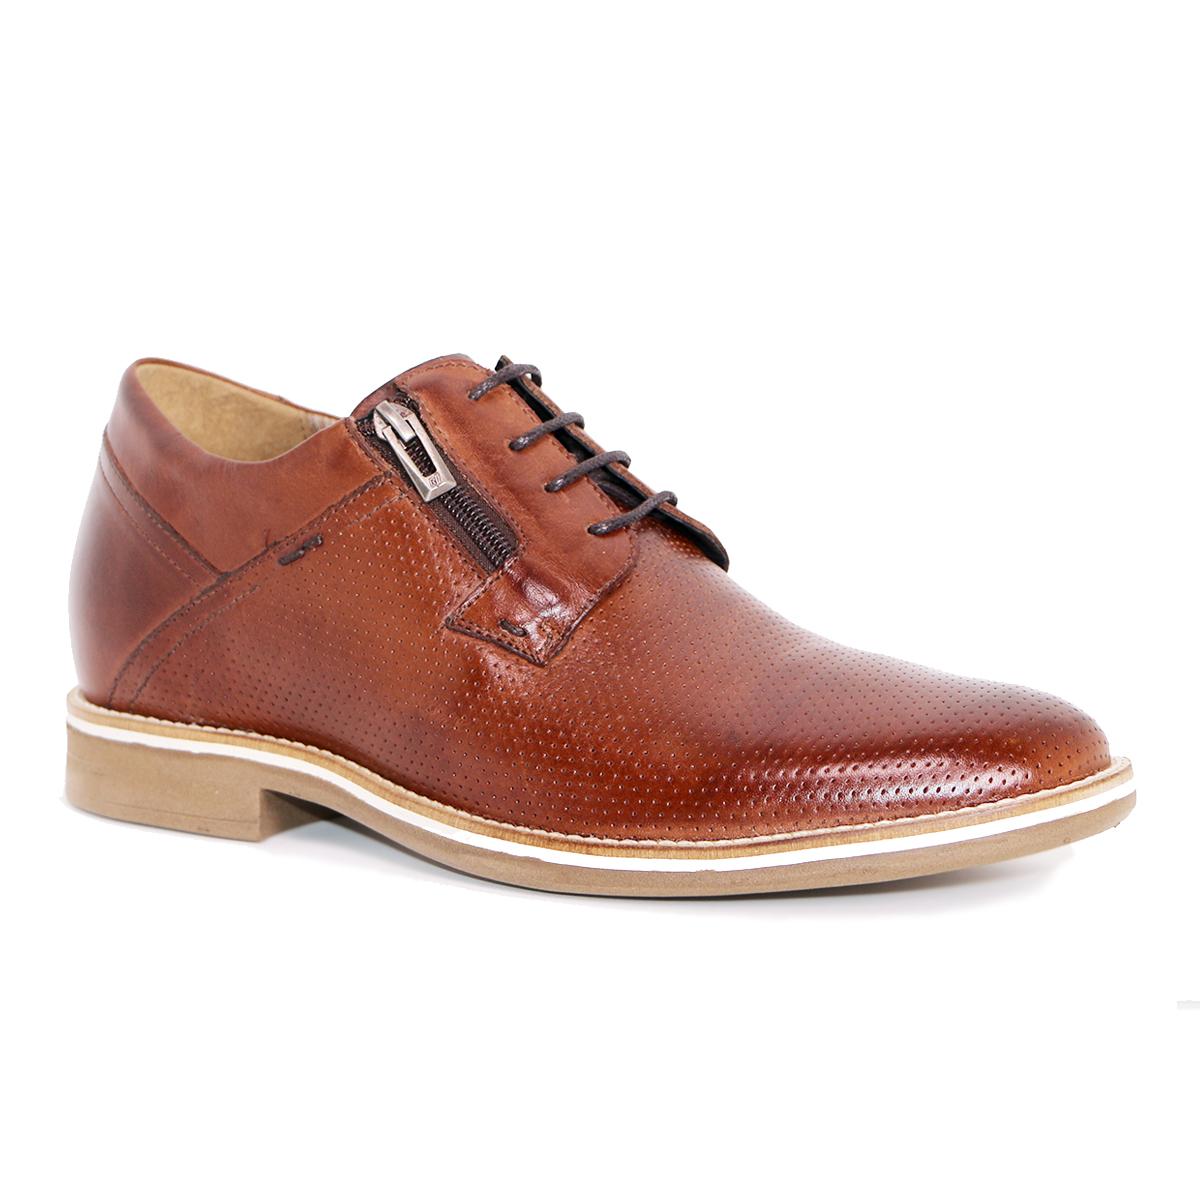 Zapato Casual Break Café Max Denegri +7cms De Altura_72929